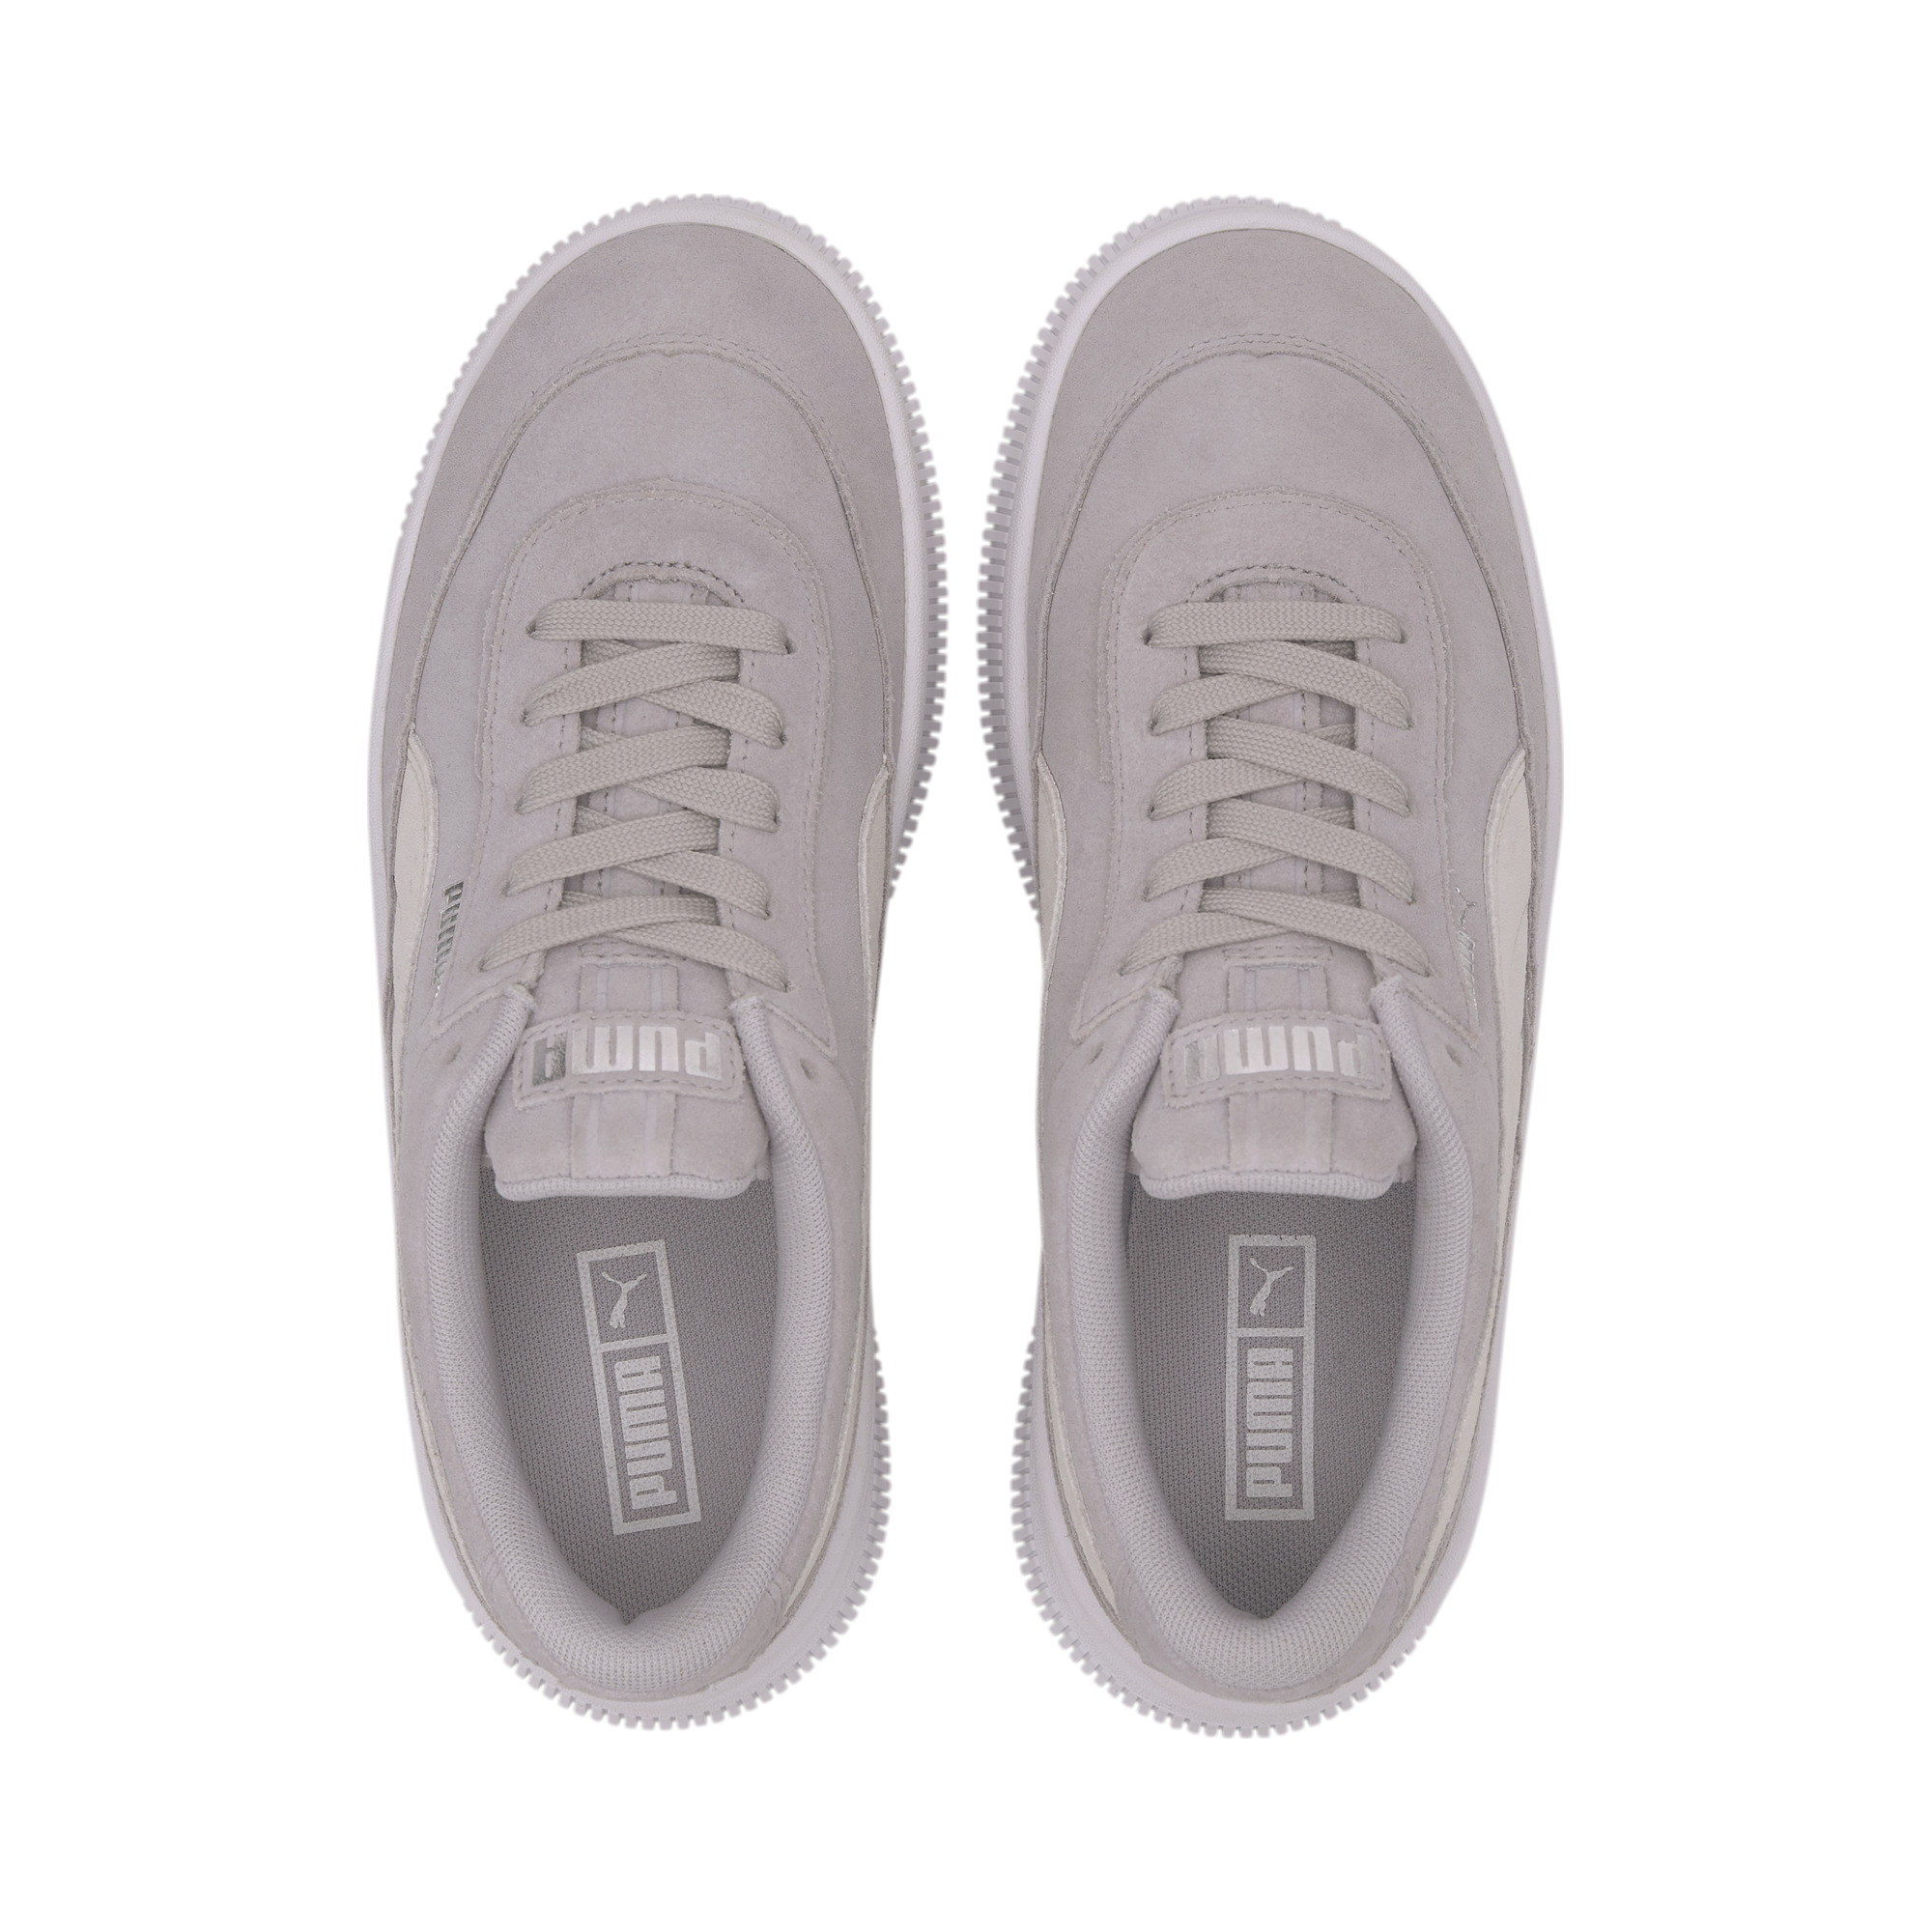 PUMA-Women-039-s-DEVA-Suede-Sneakers thumbnail 22